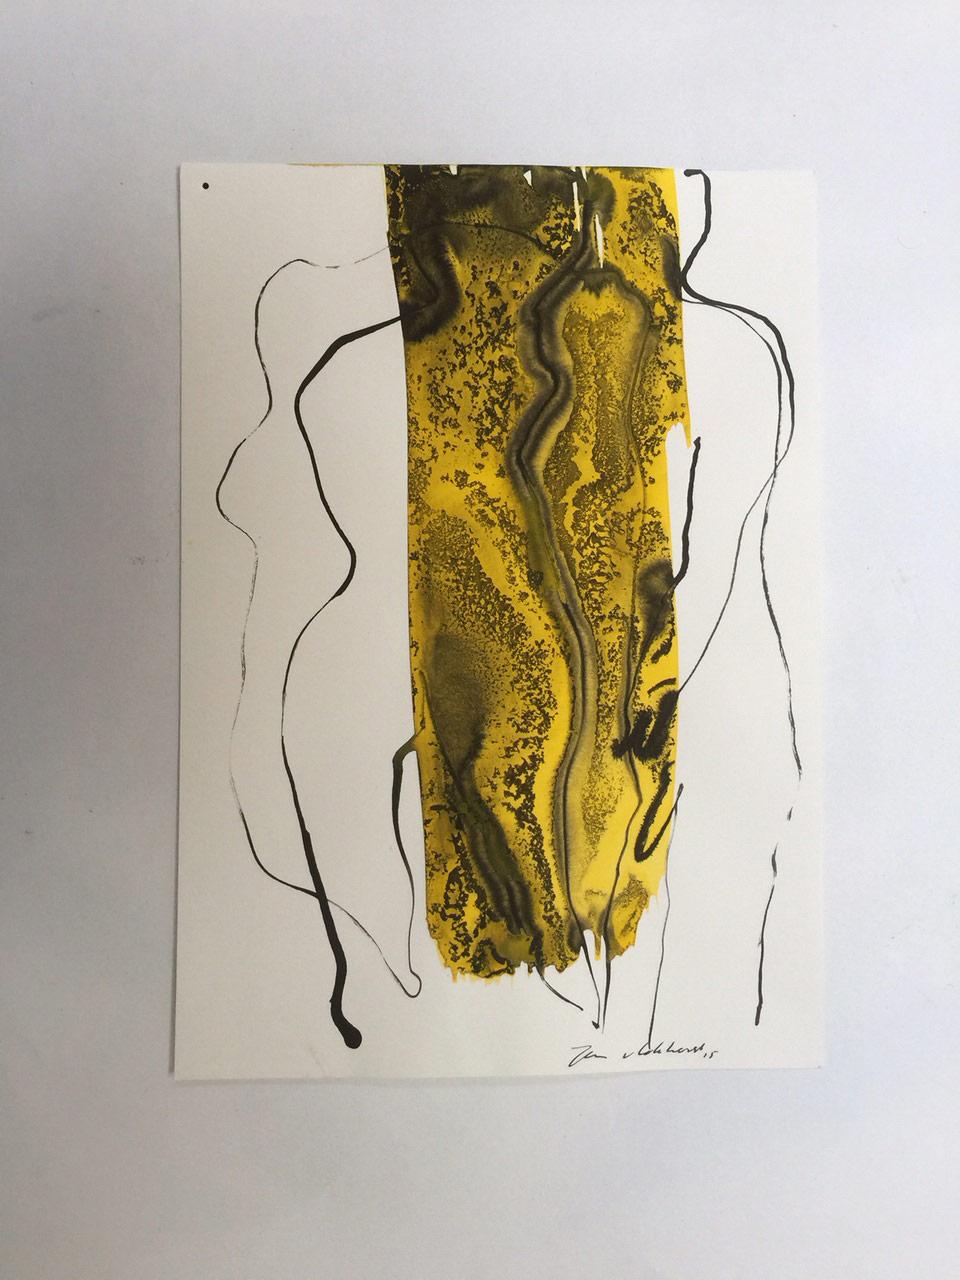 Gemengde techniek op papier, Jan van Lokhorst